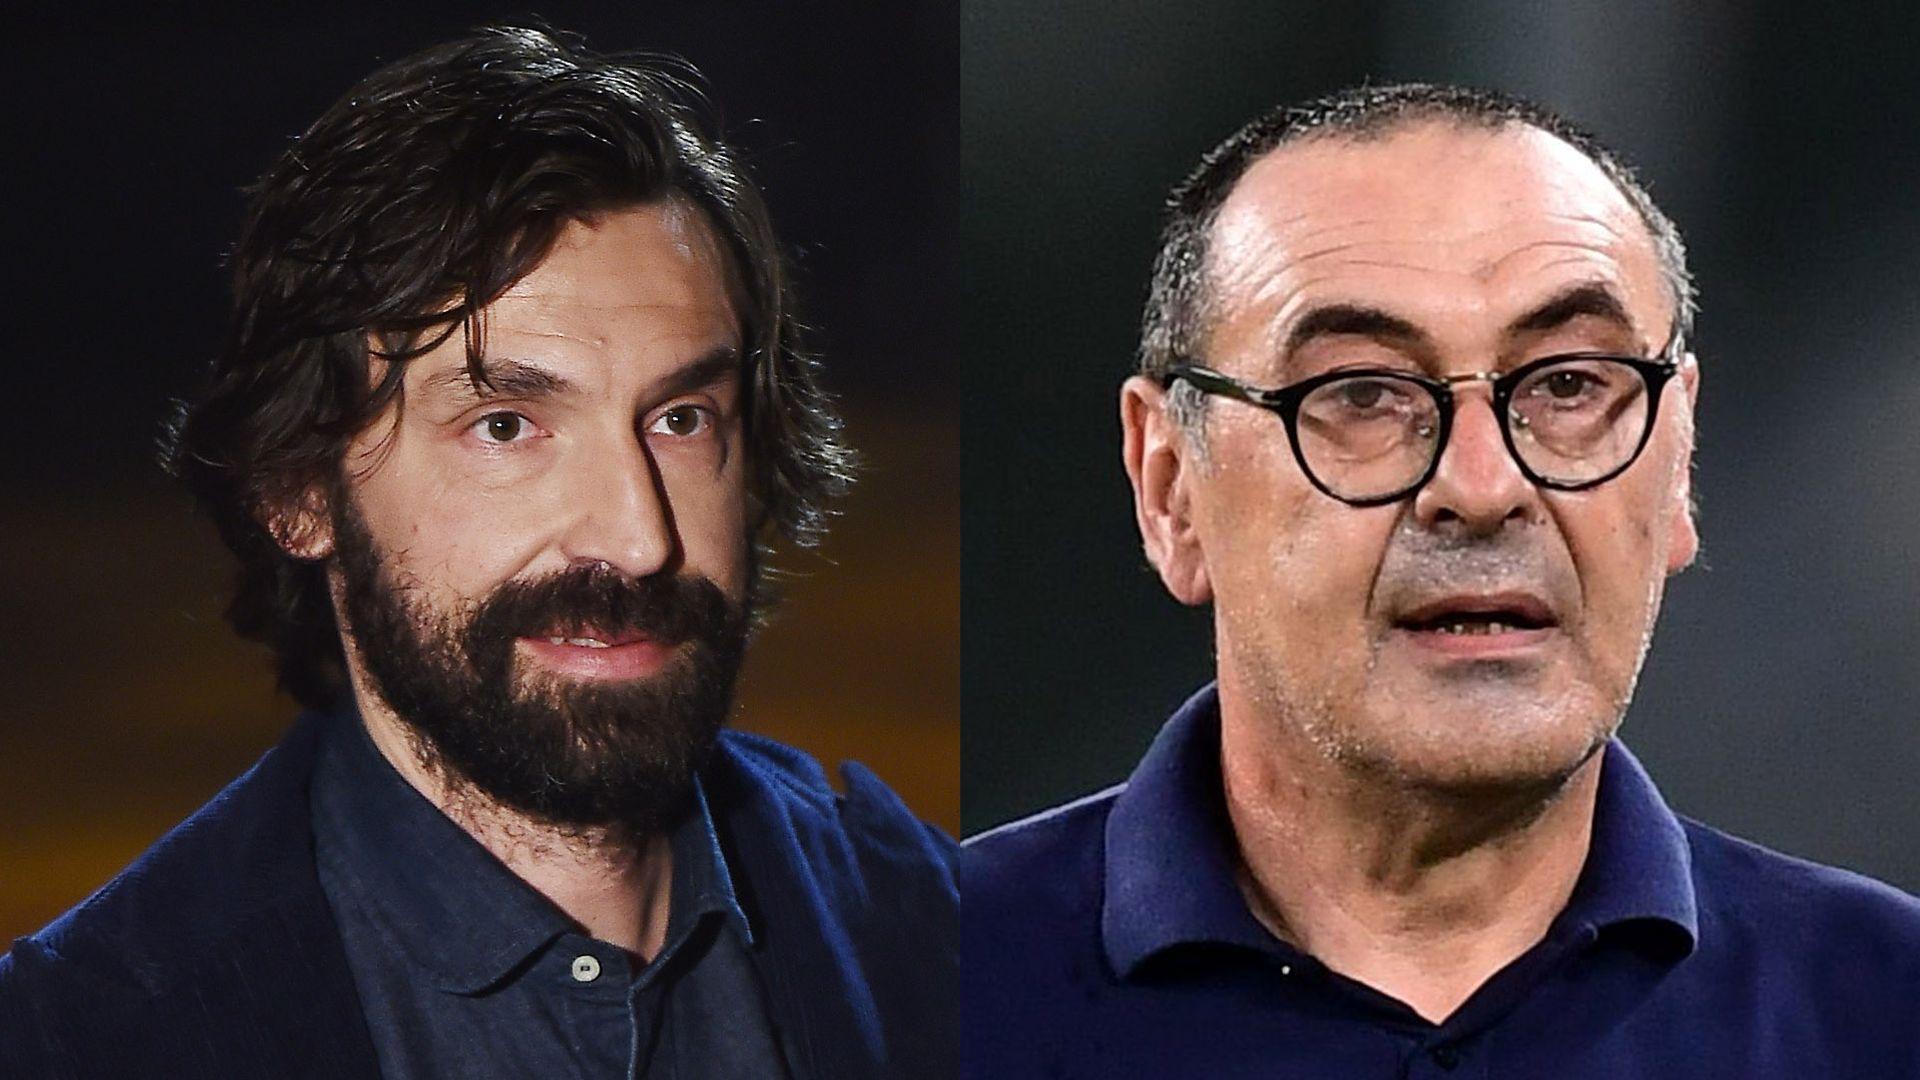 Juve: Sarri's failure, Pirlo's project